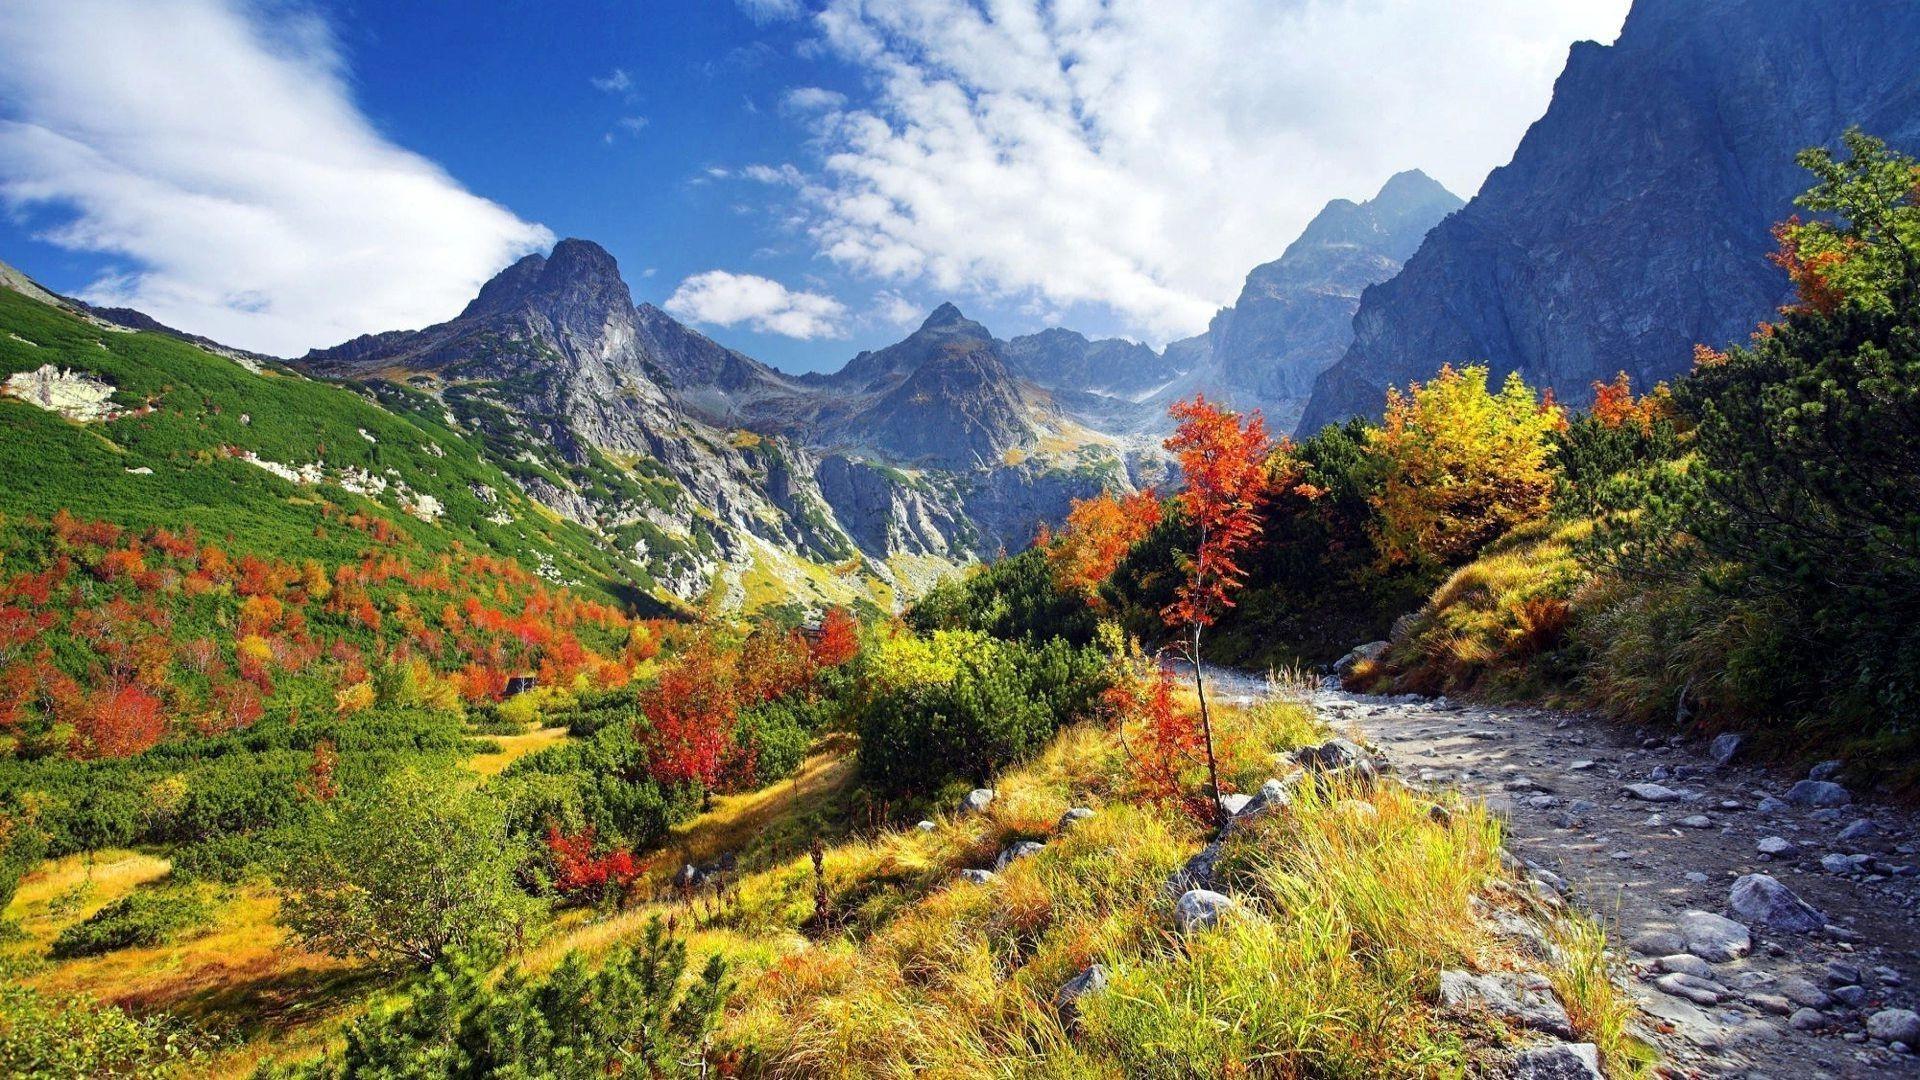 Autumn Mountain Wallpaper Mobile For Free Wallpaper